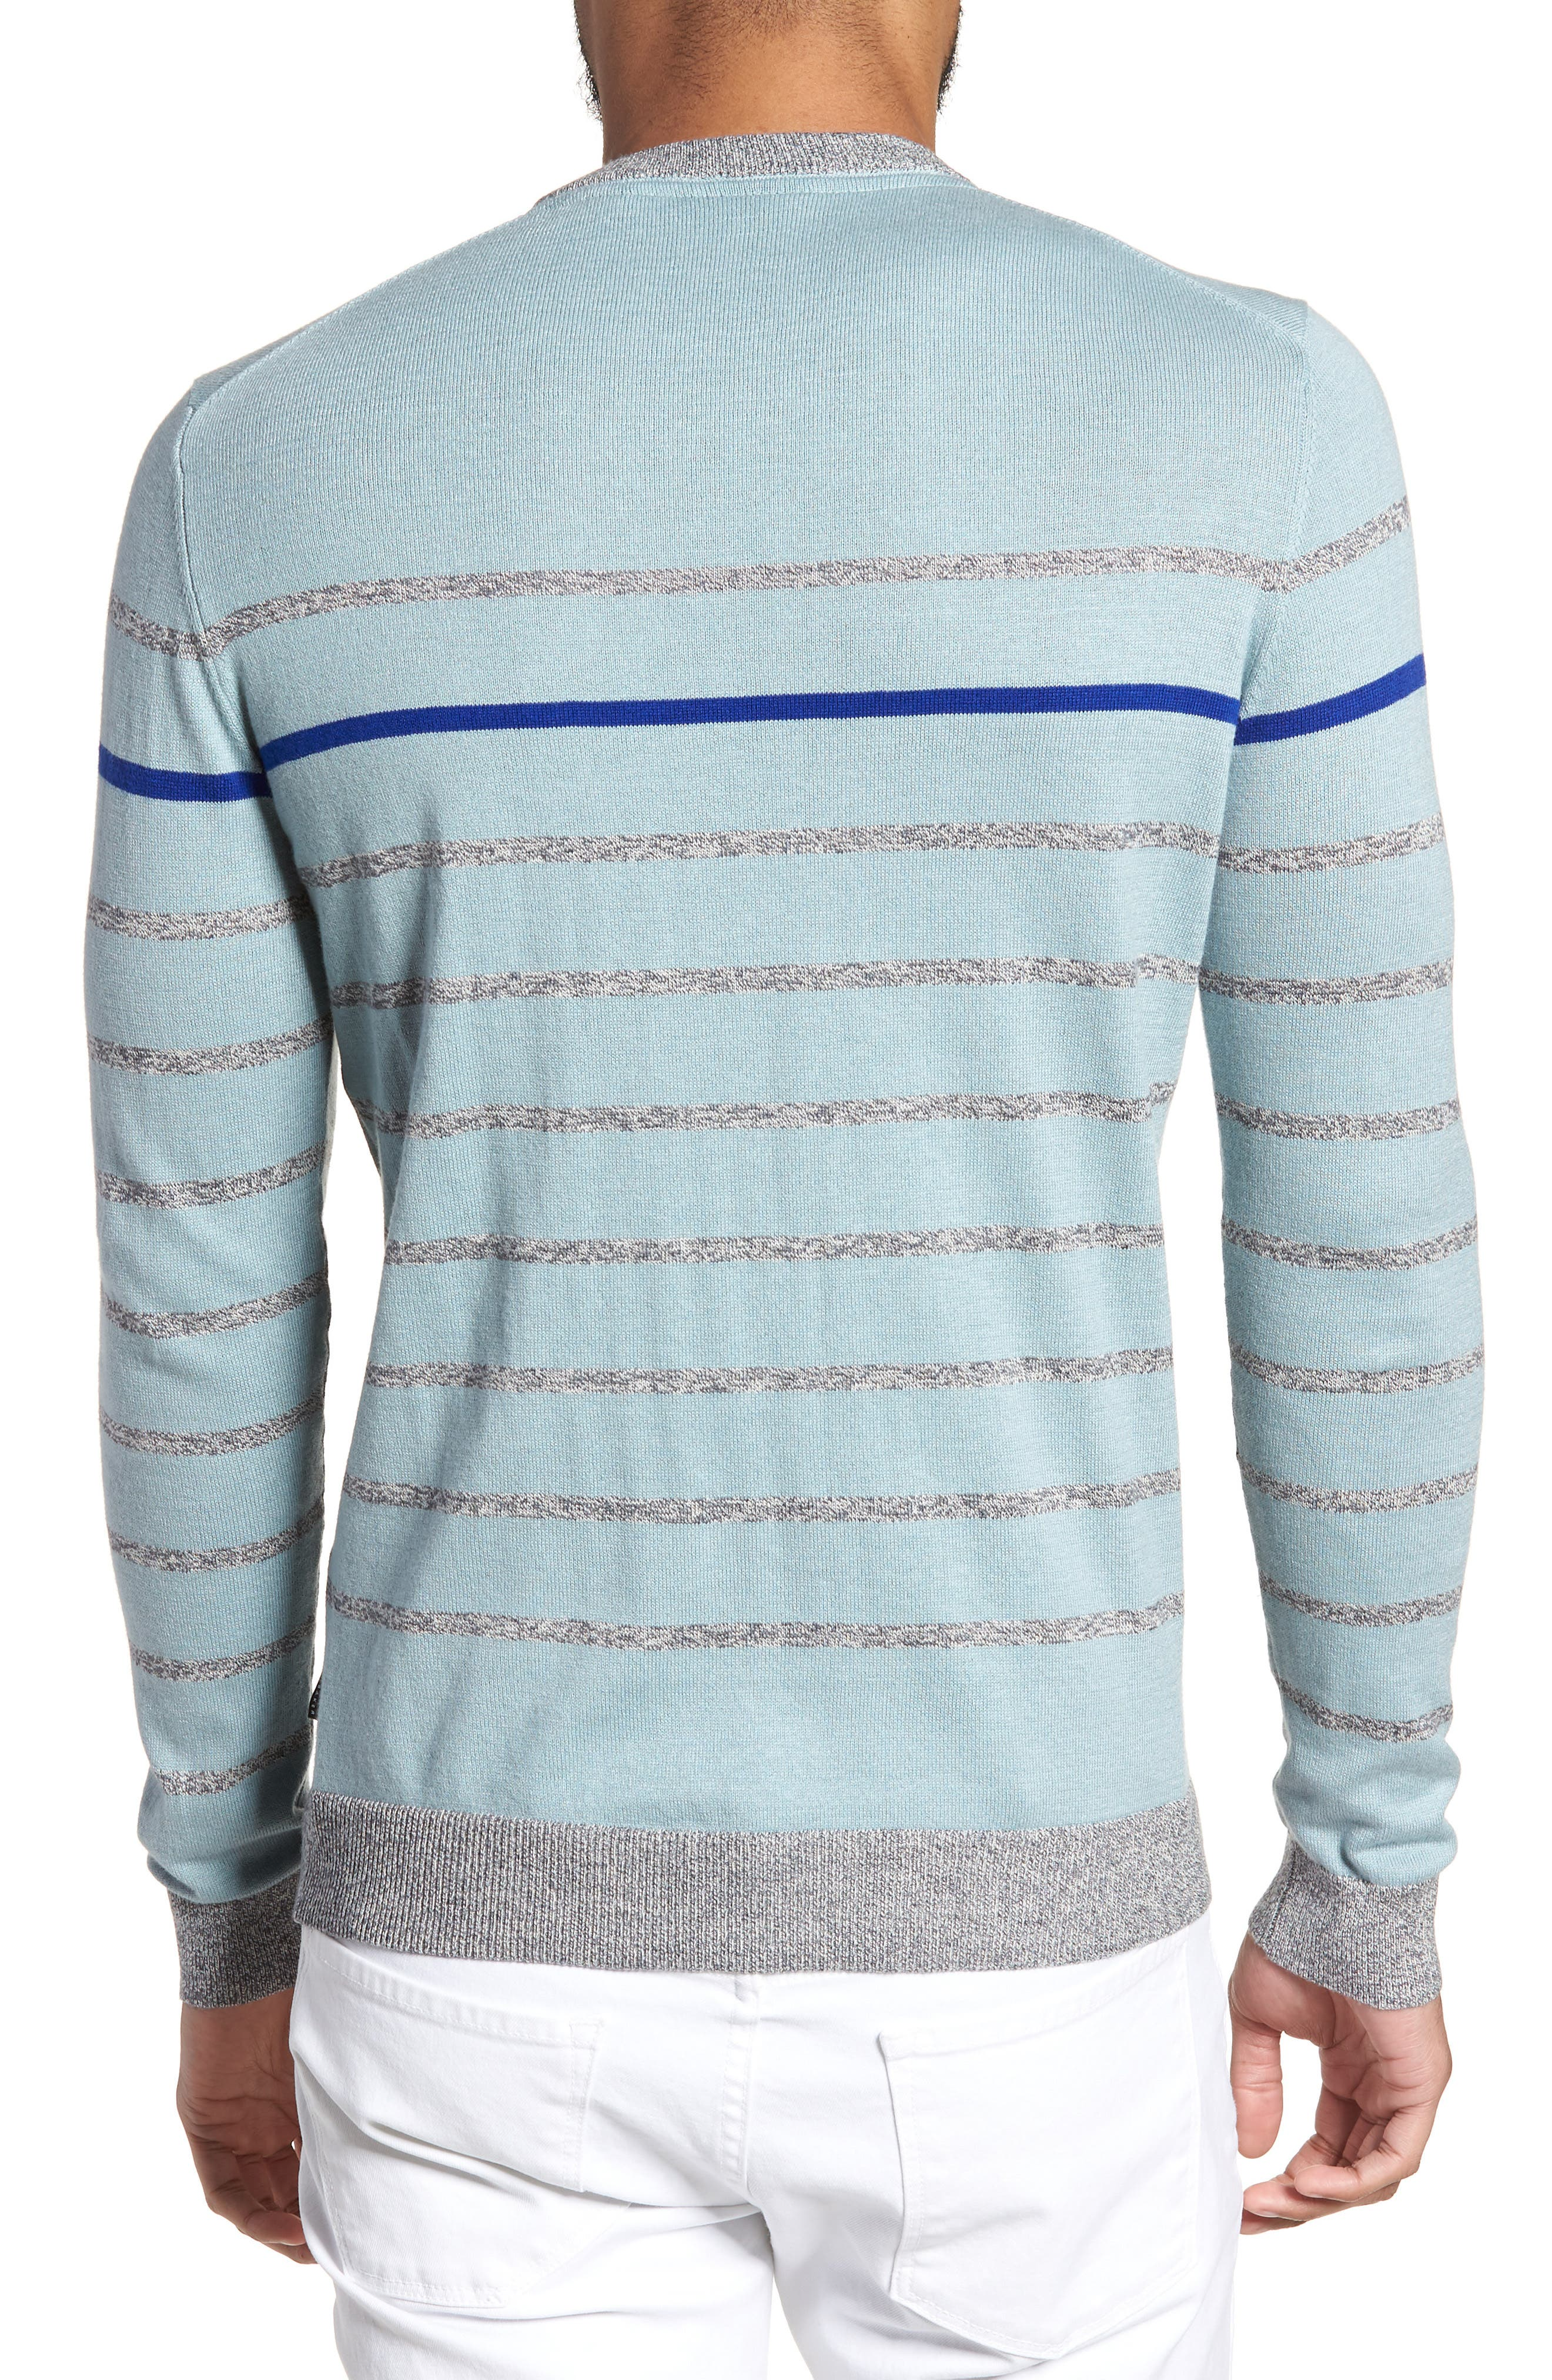 Britnay Trim Fit Stripe Crewneck Sweater,                             Alternate thumbnail 2, color,                             400